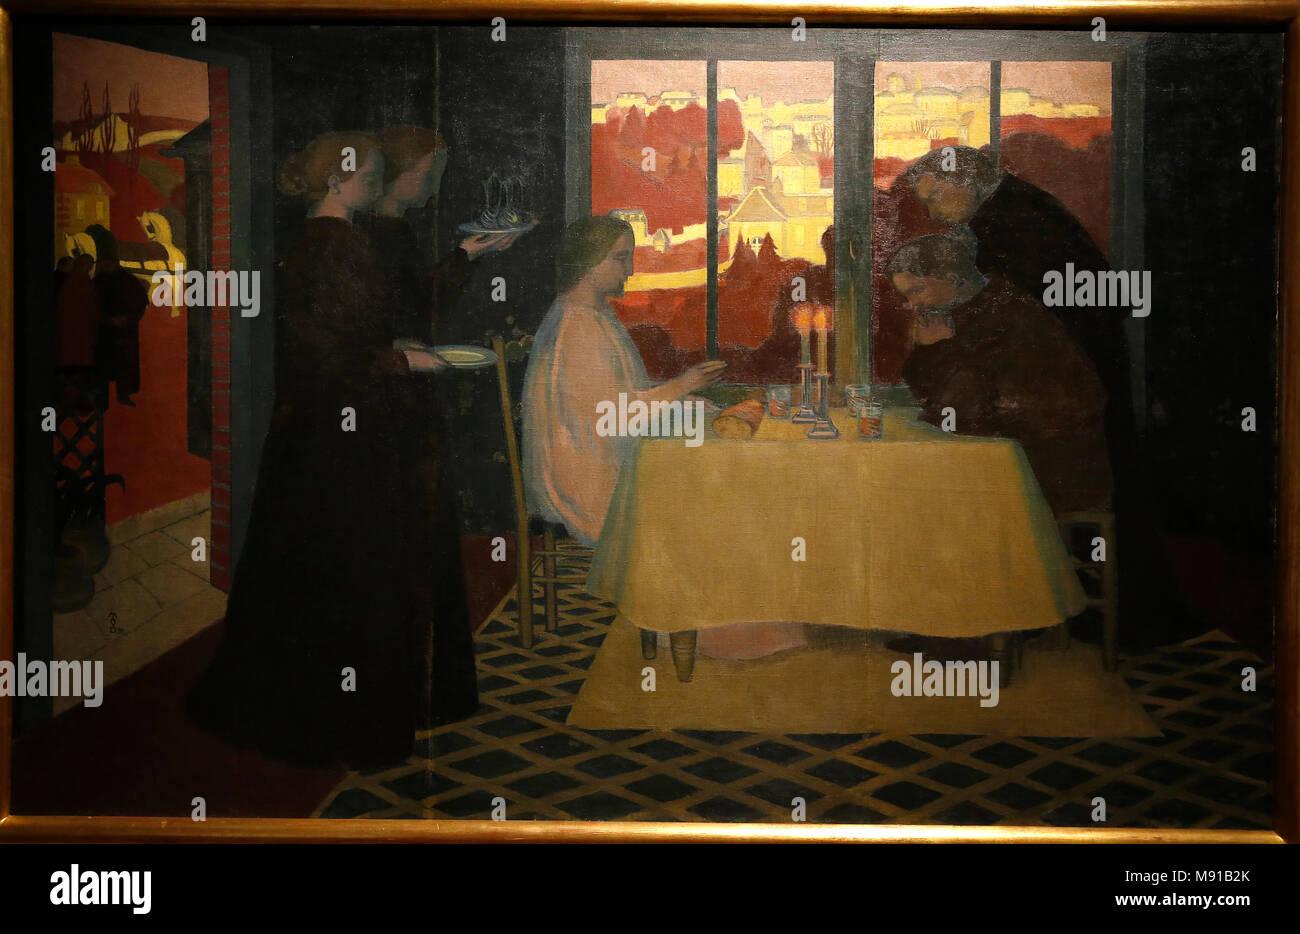 Maurice Denis museum, Saint Germain en Laye, France. Maurice Denis, Les Pelerins d'Emmaus (The Emmaus pilgrims), oil on canvas, 1895. - Stock Image